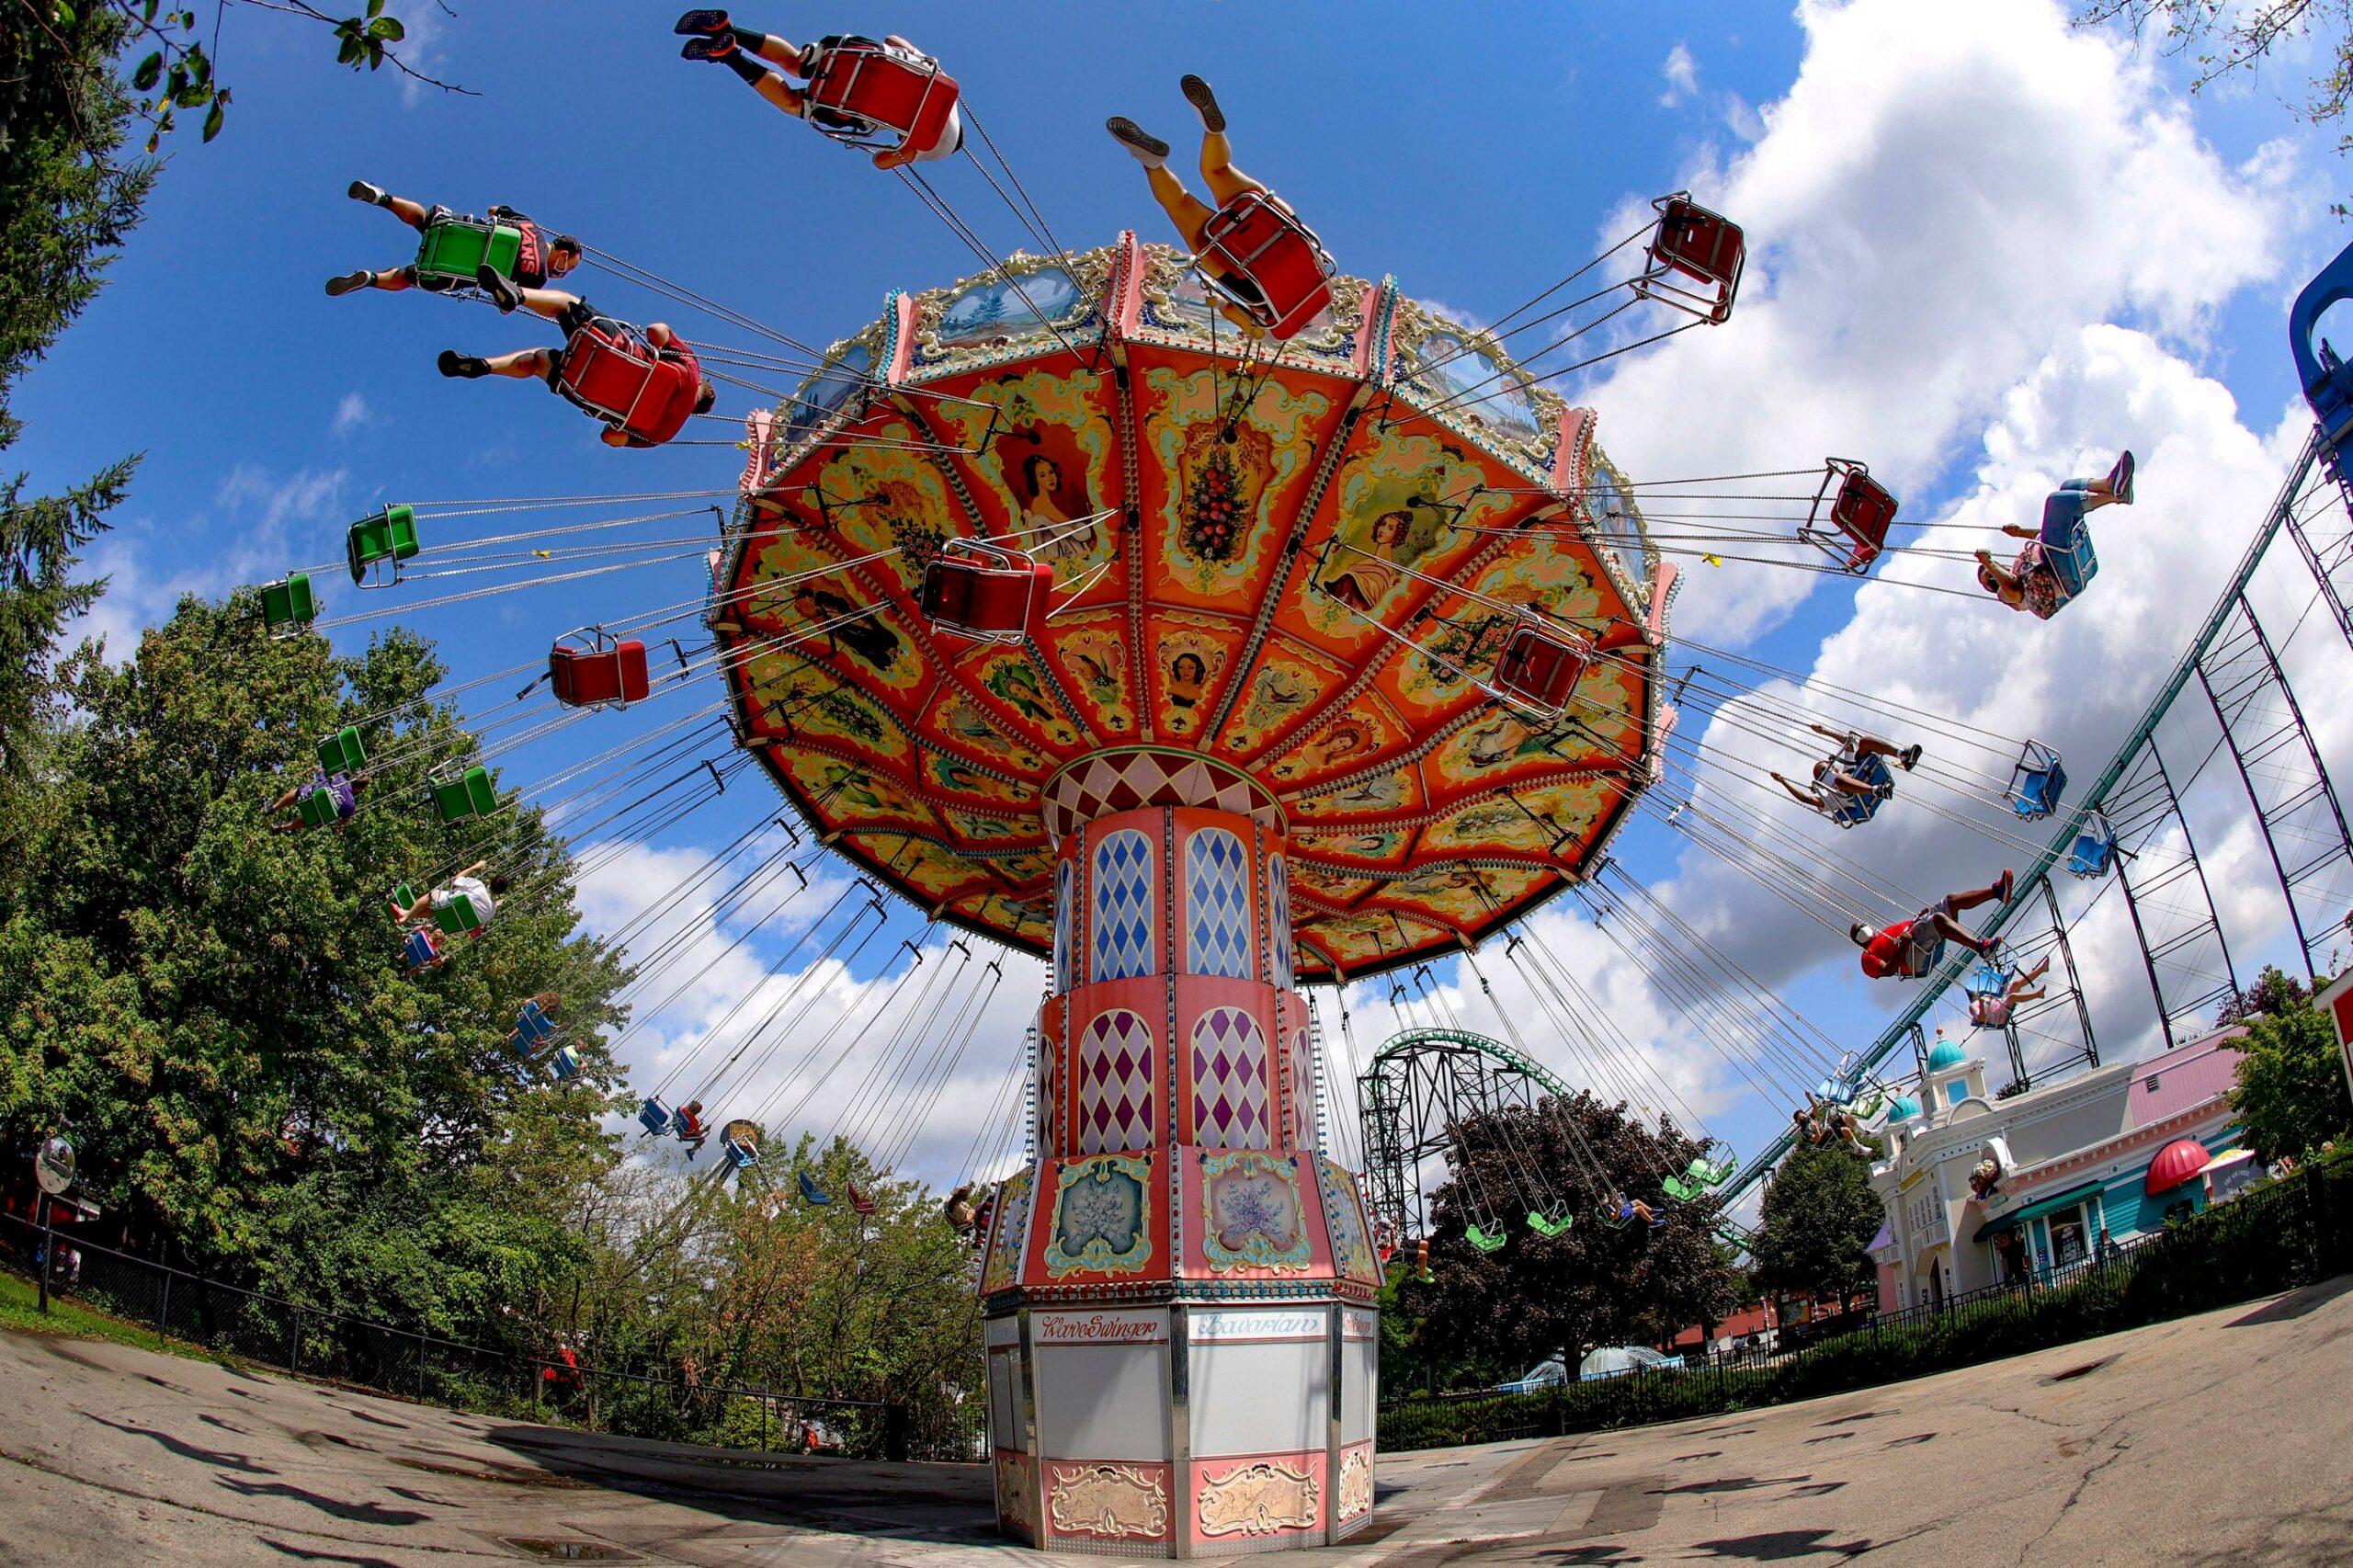 trip to theme park theme parks travel planner app